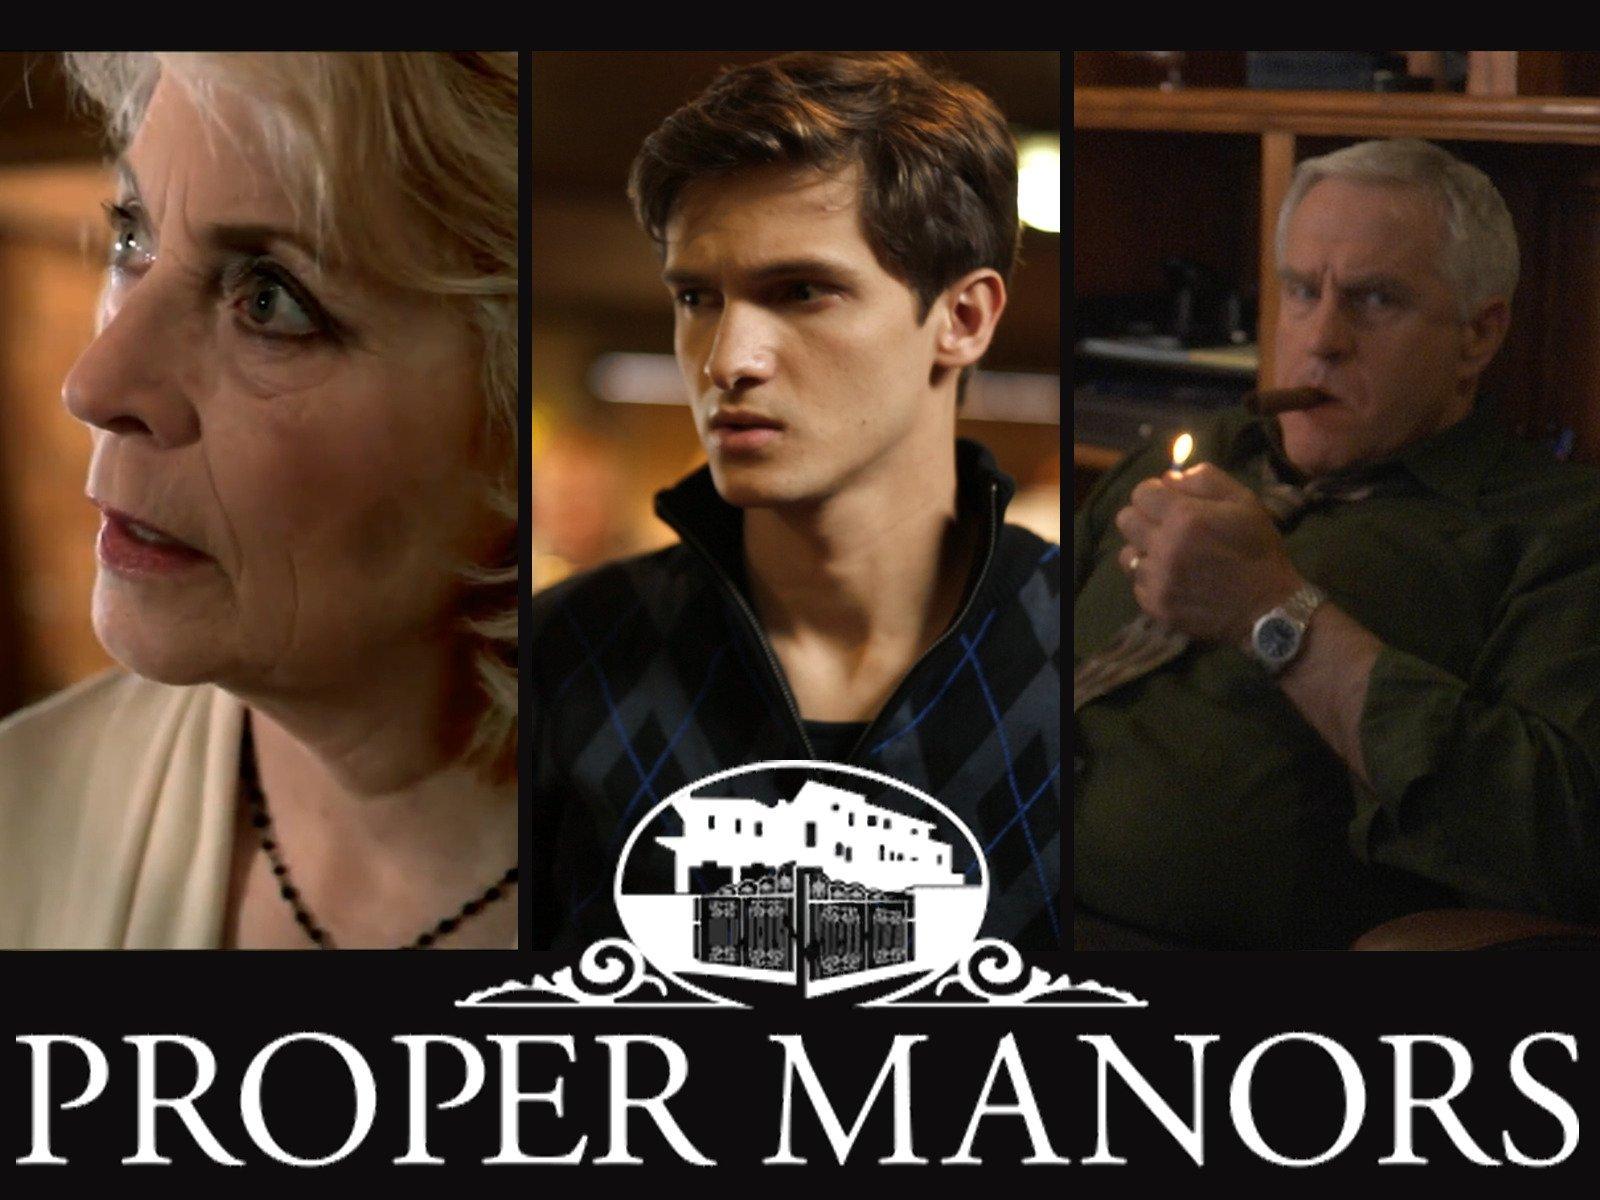 Proper Manors